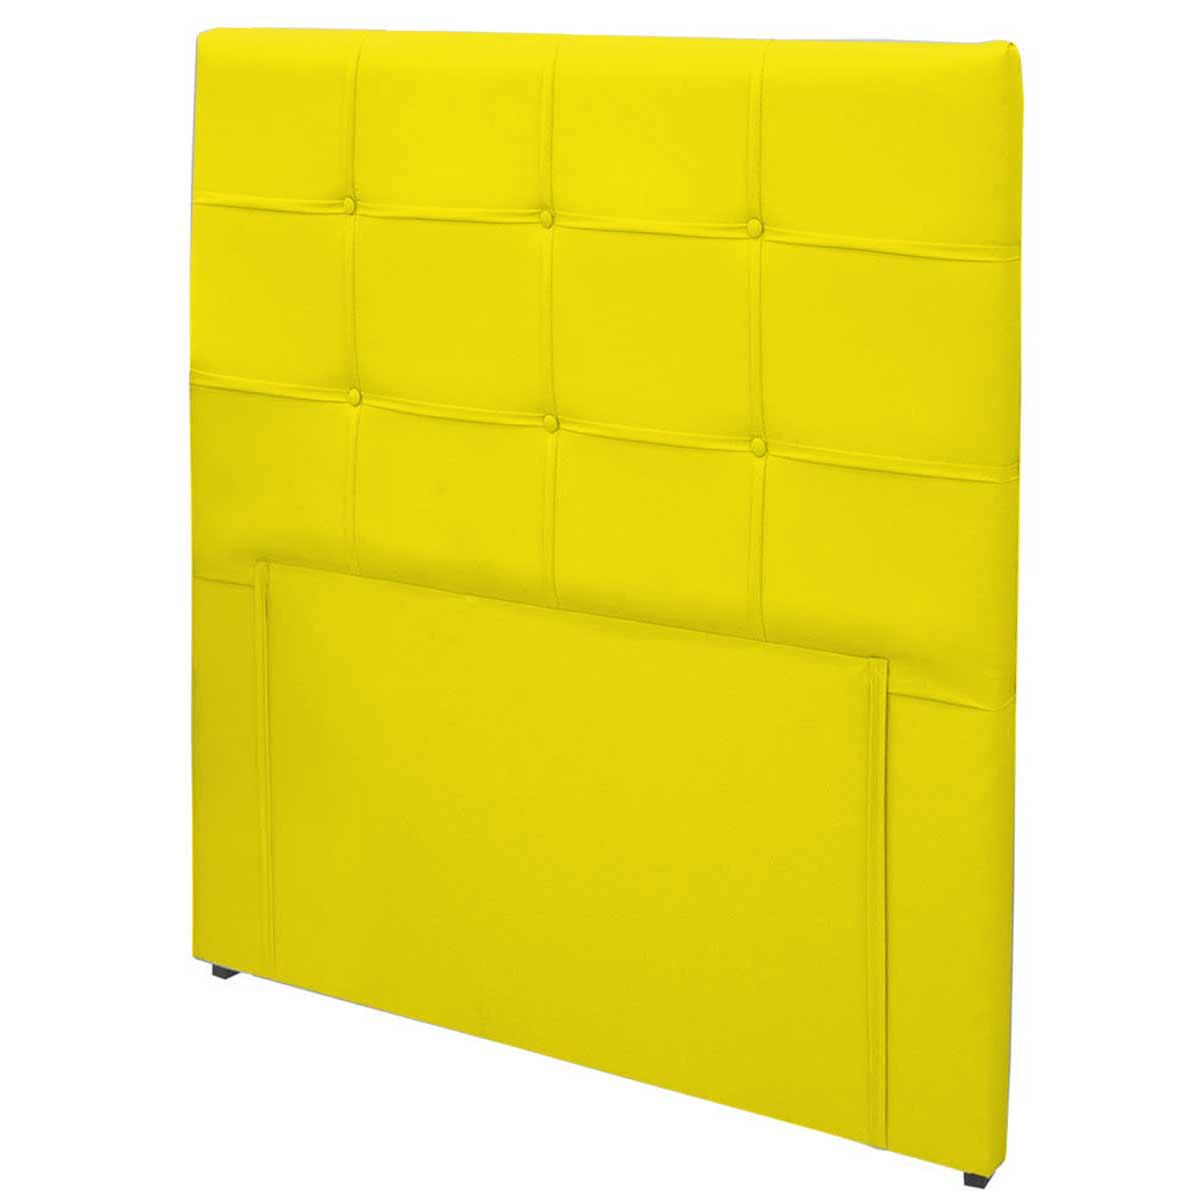 Cabeceira Casal Estofada Ana Luísa 140 cm Corino Amarelo